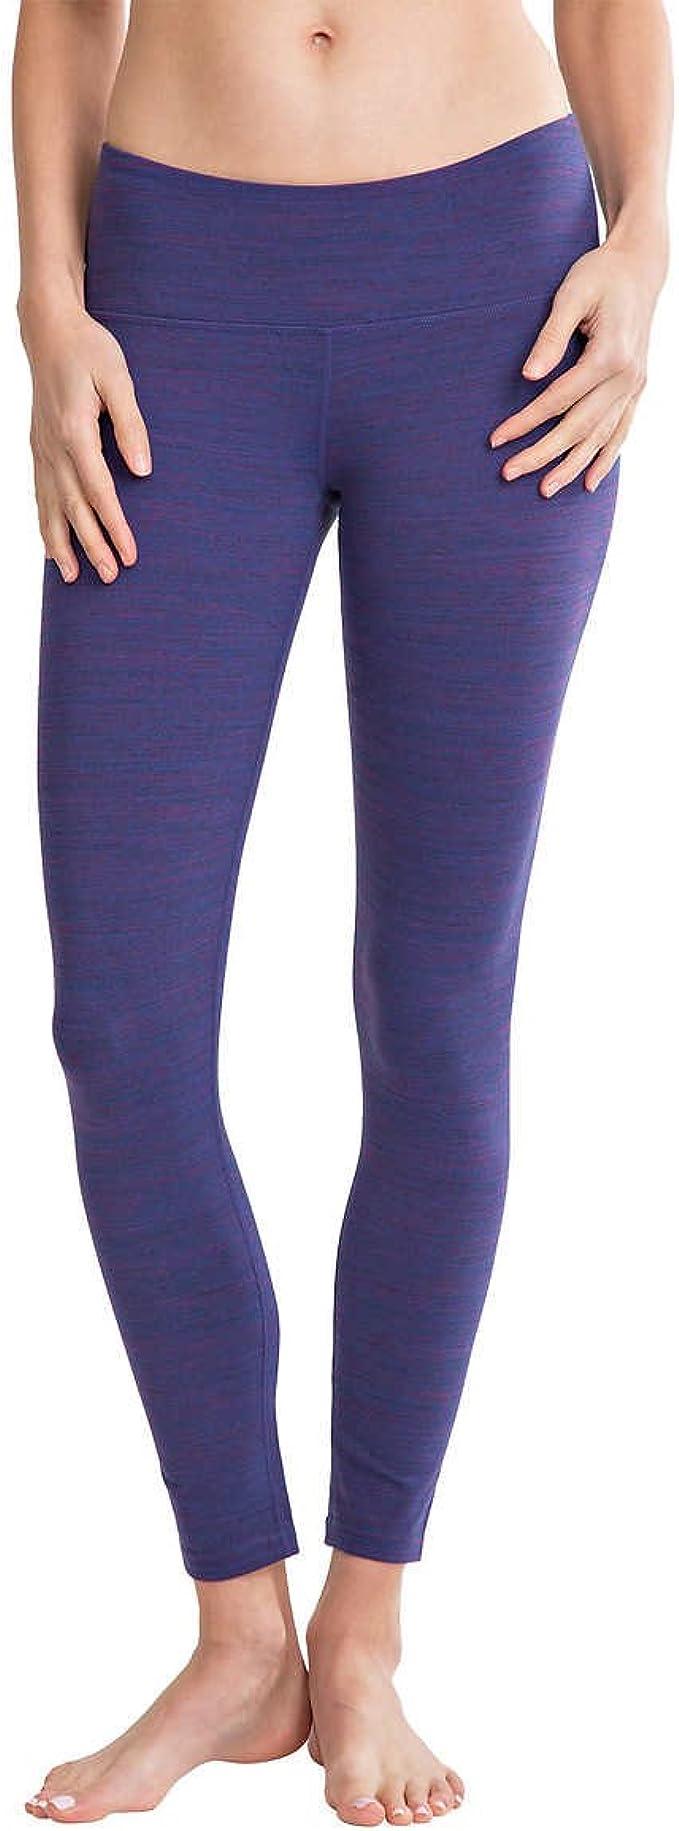 PURPLE Yoga Leggings